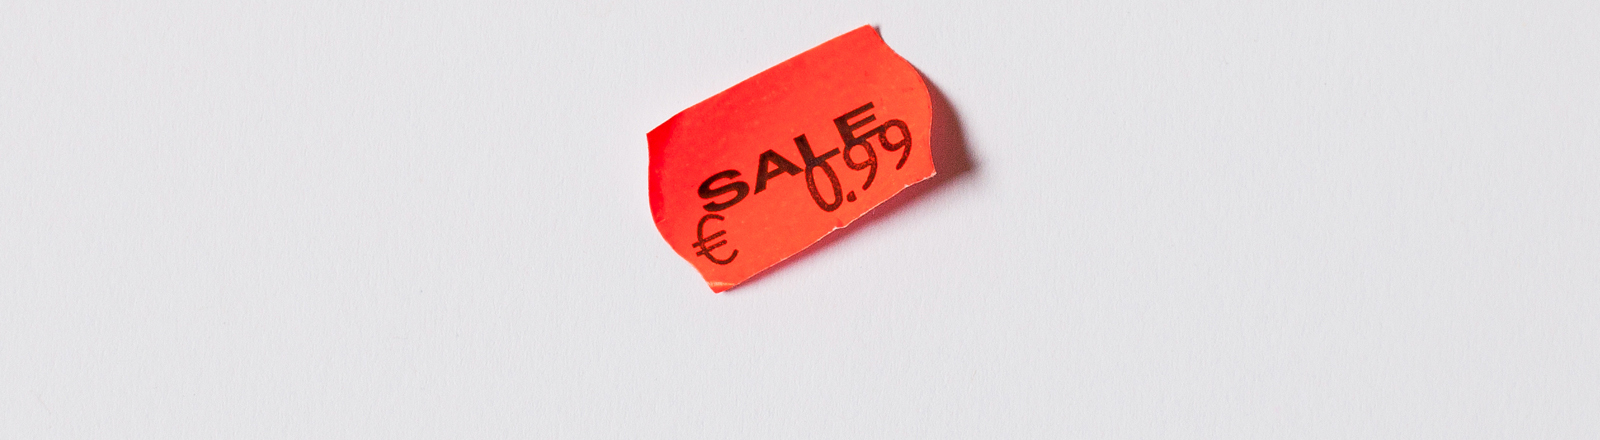 oranges Preisschild, Rabatt